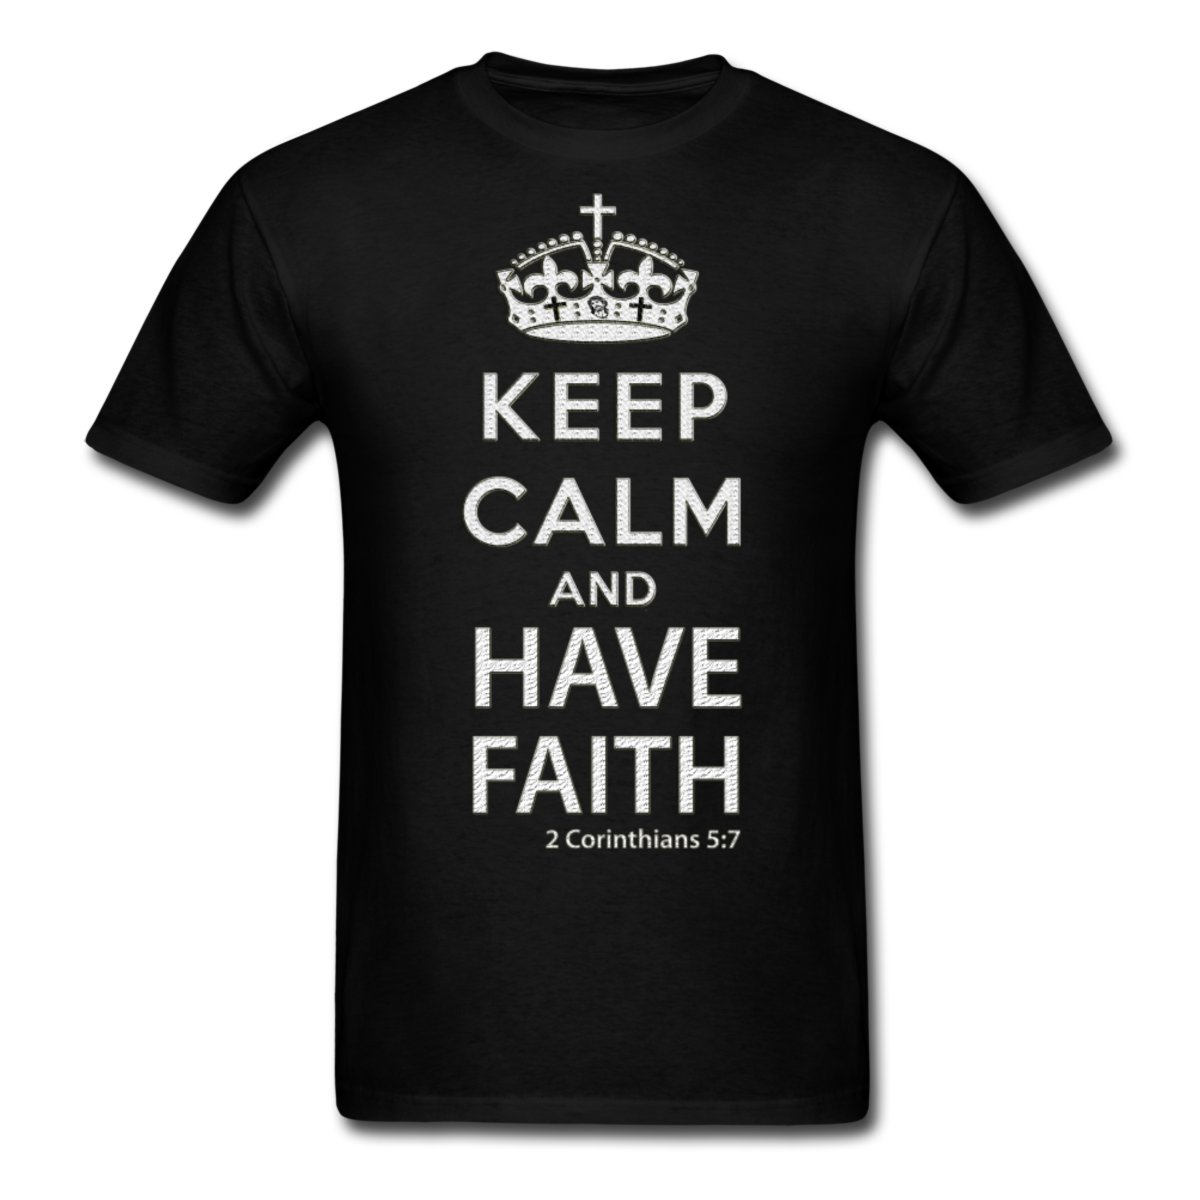 Mantenga la calma y tenga fe (2 Corintios 5: 7) Camiseta para hombre Nueva moda para hombre Camiseta de manga corta Camiseta de algodón Camiseta